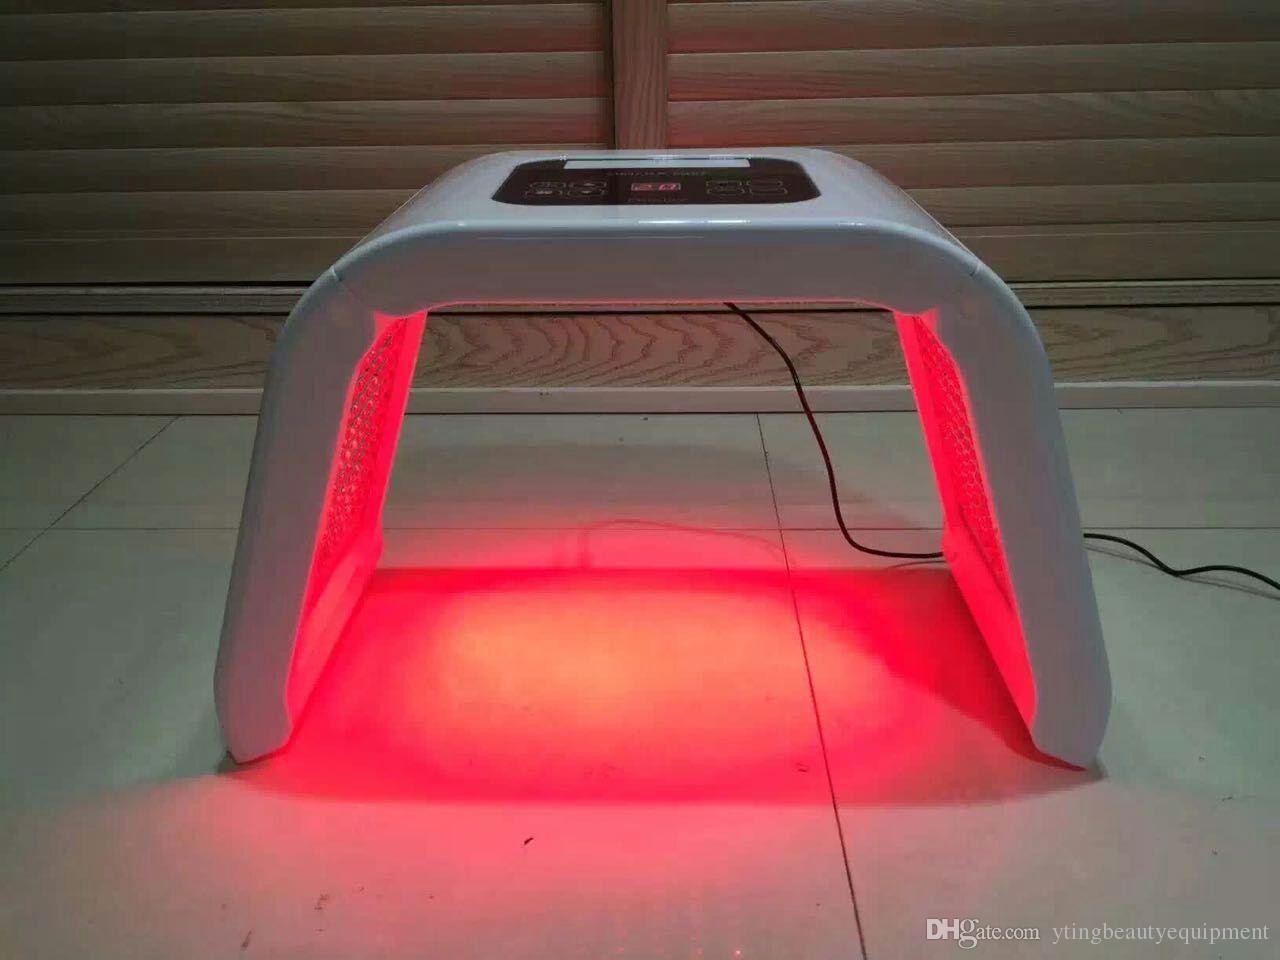 2016 Nova 4 Cores Luz PDT LEVOU Terapia Acne Freckle Remoção Clareamento máquina de beleza photon